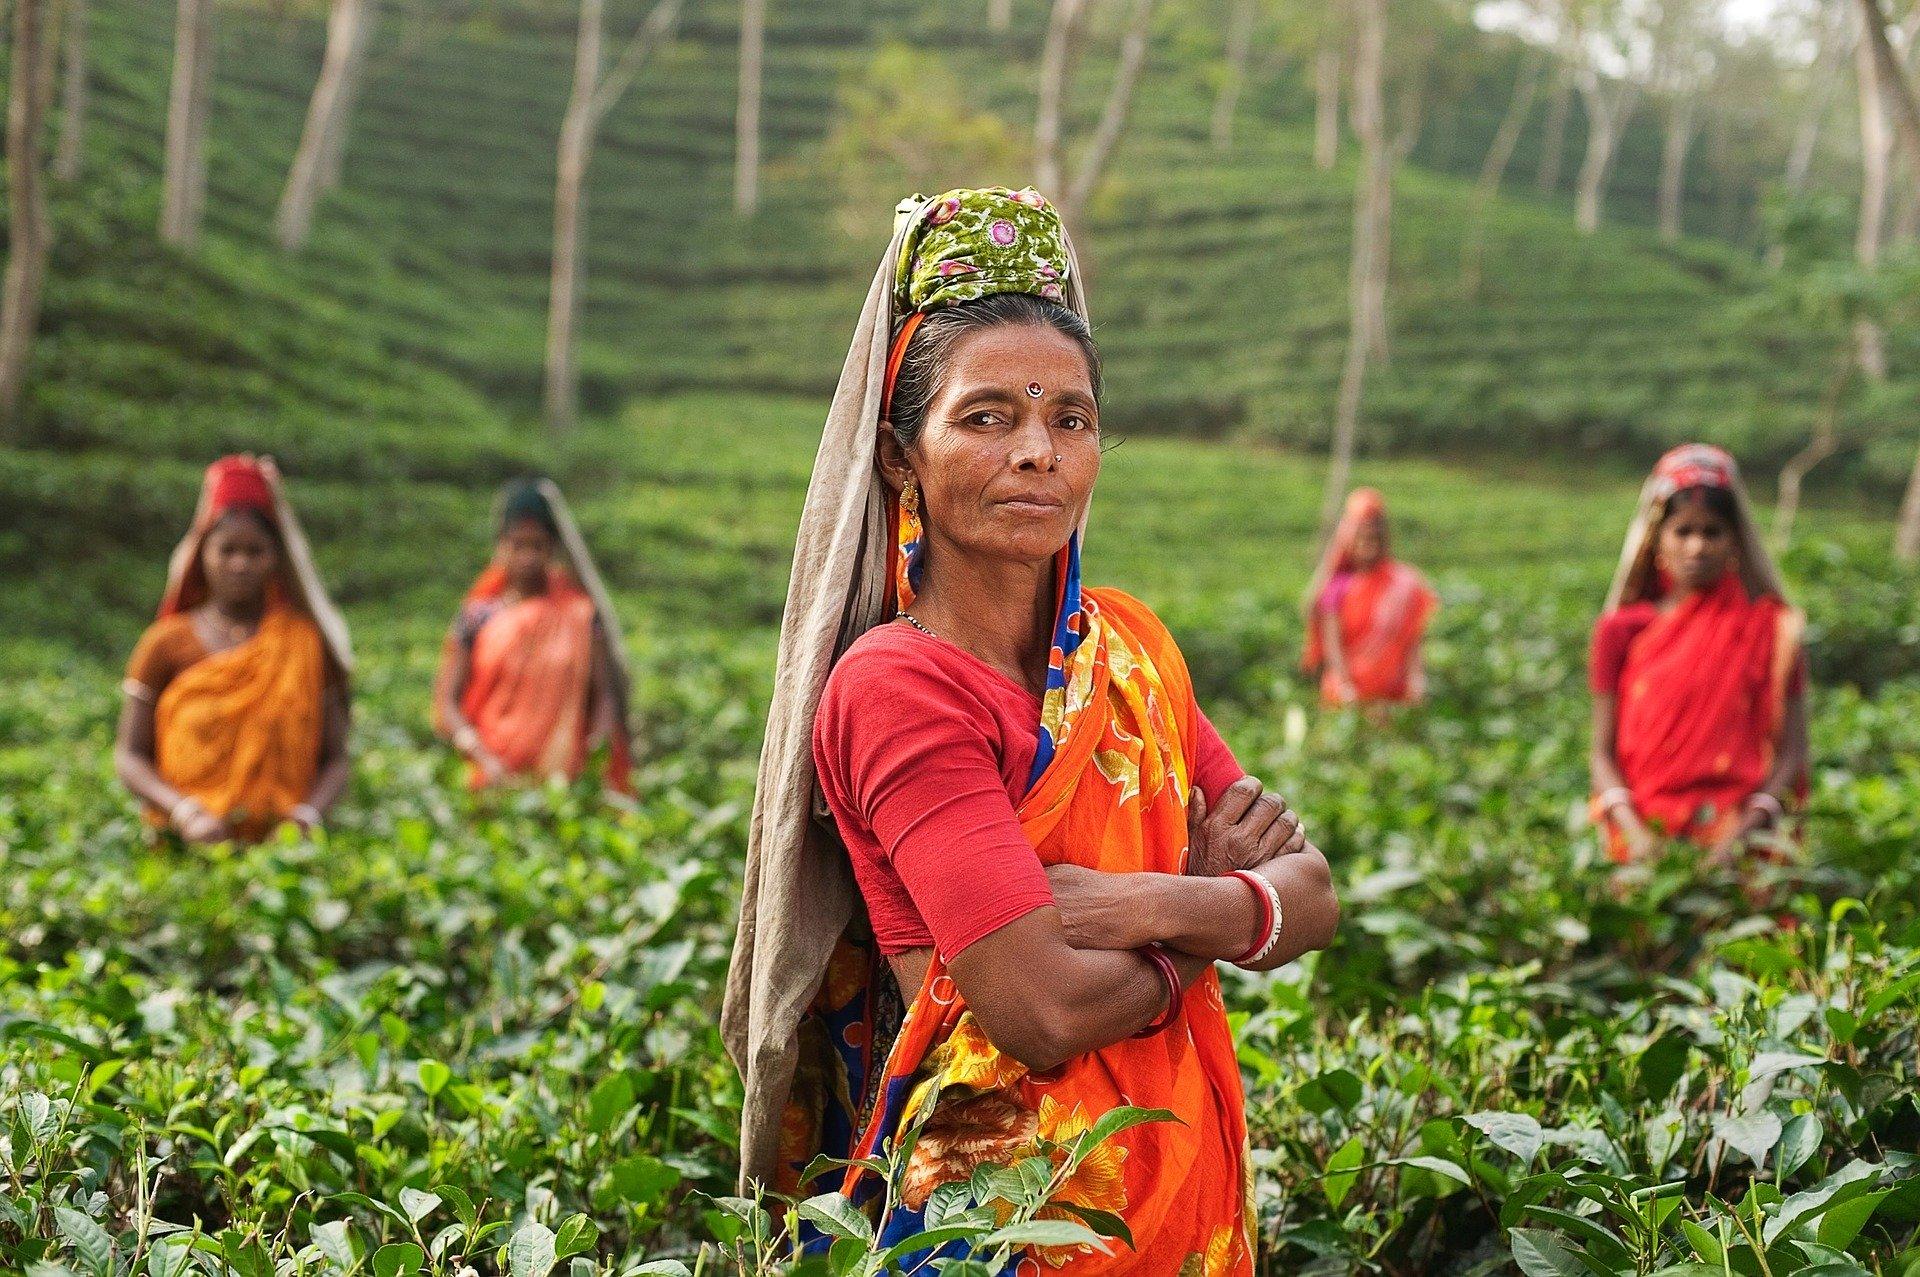 Person, Woman, India, Fields, Plantage, Tea, Plants